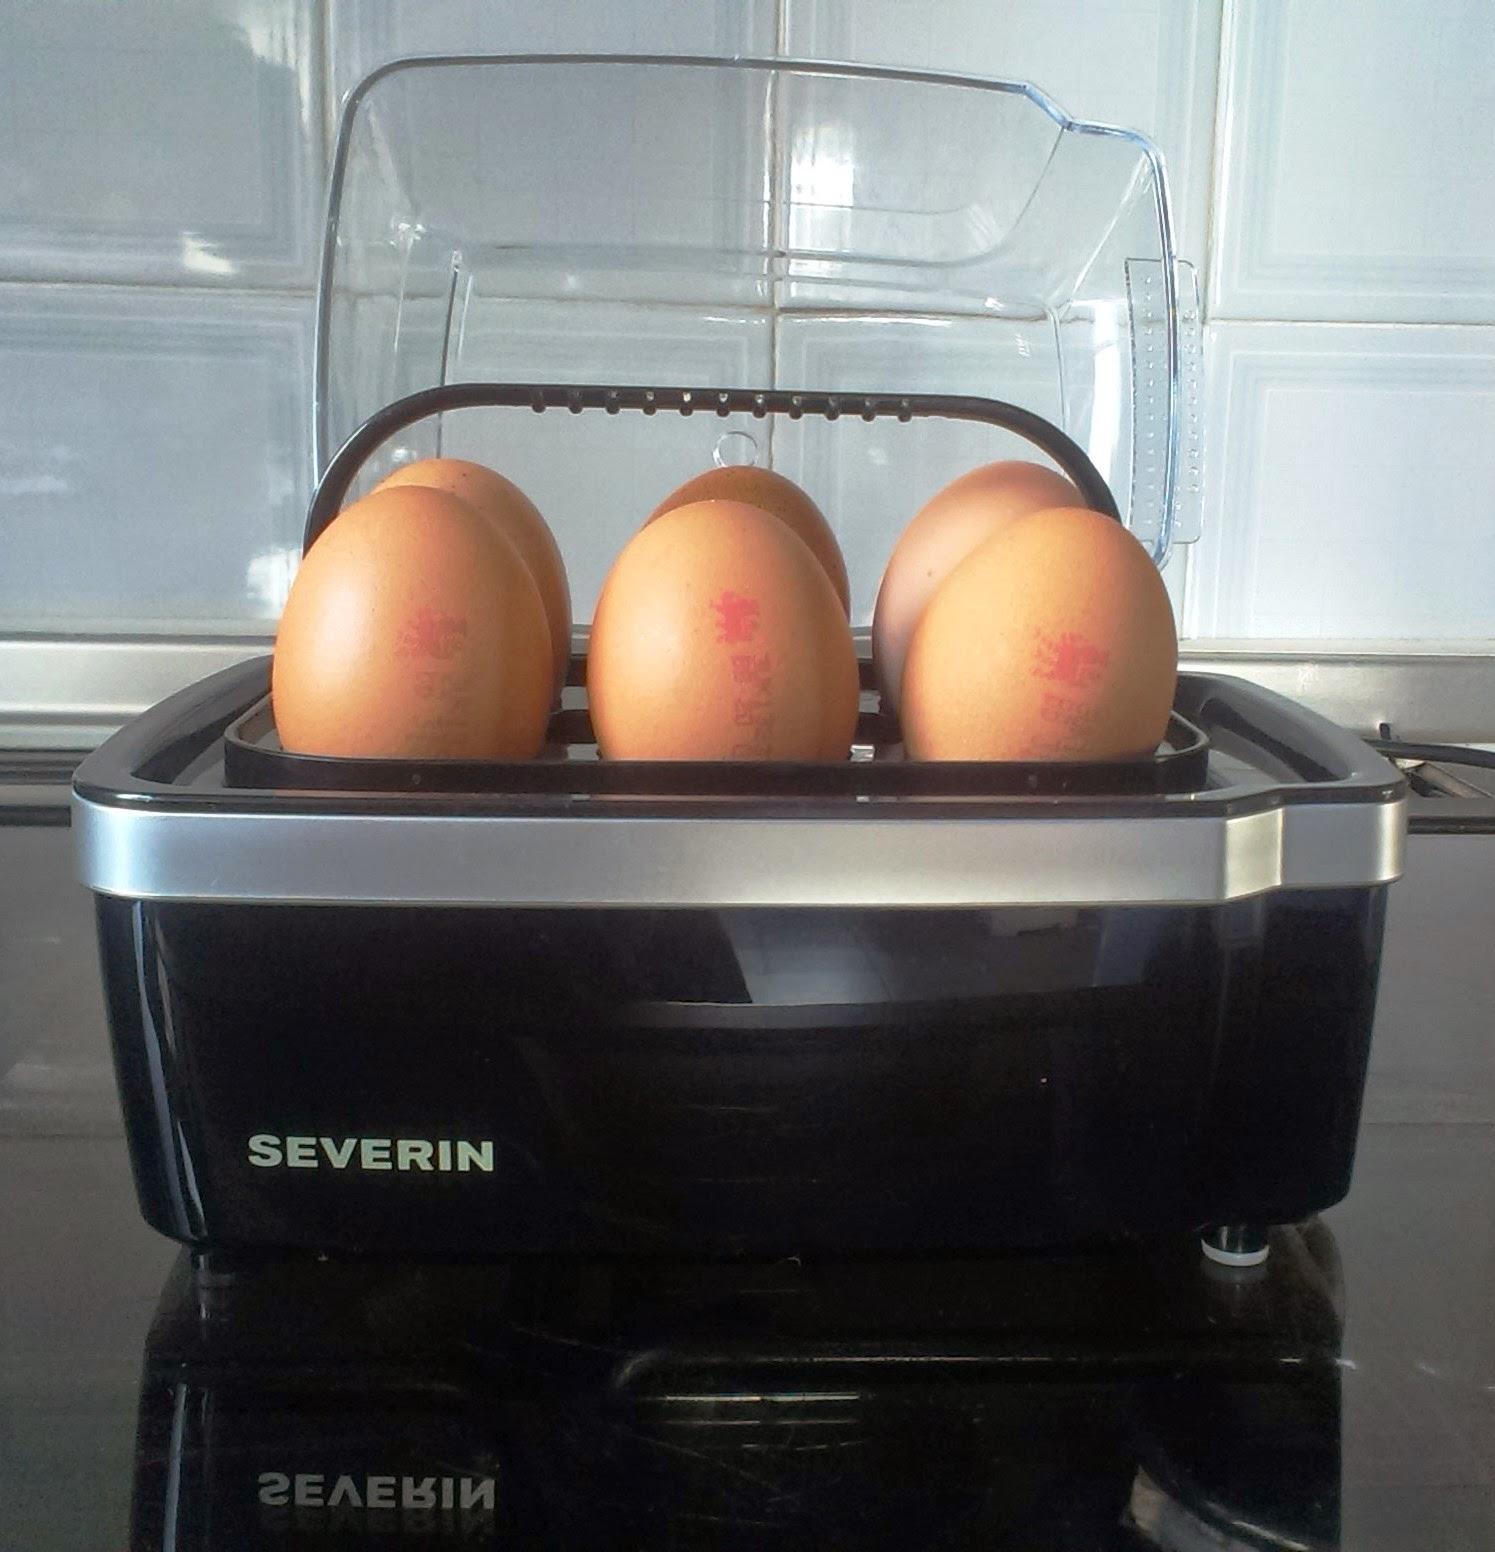 Severin Titanium Electronic Egg Boiler